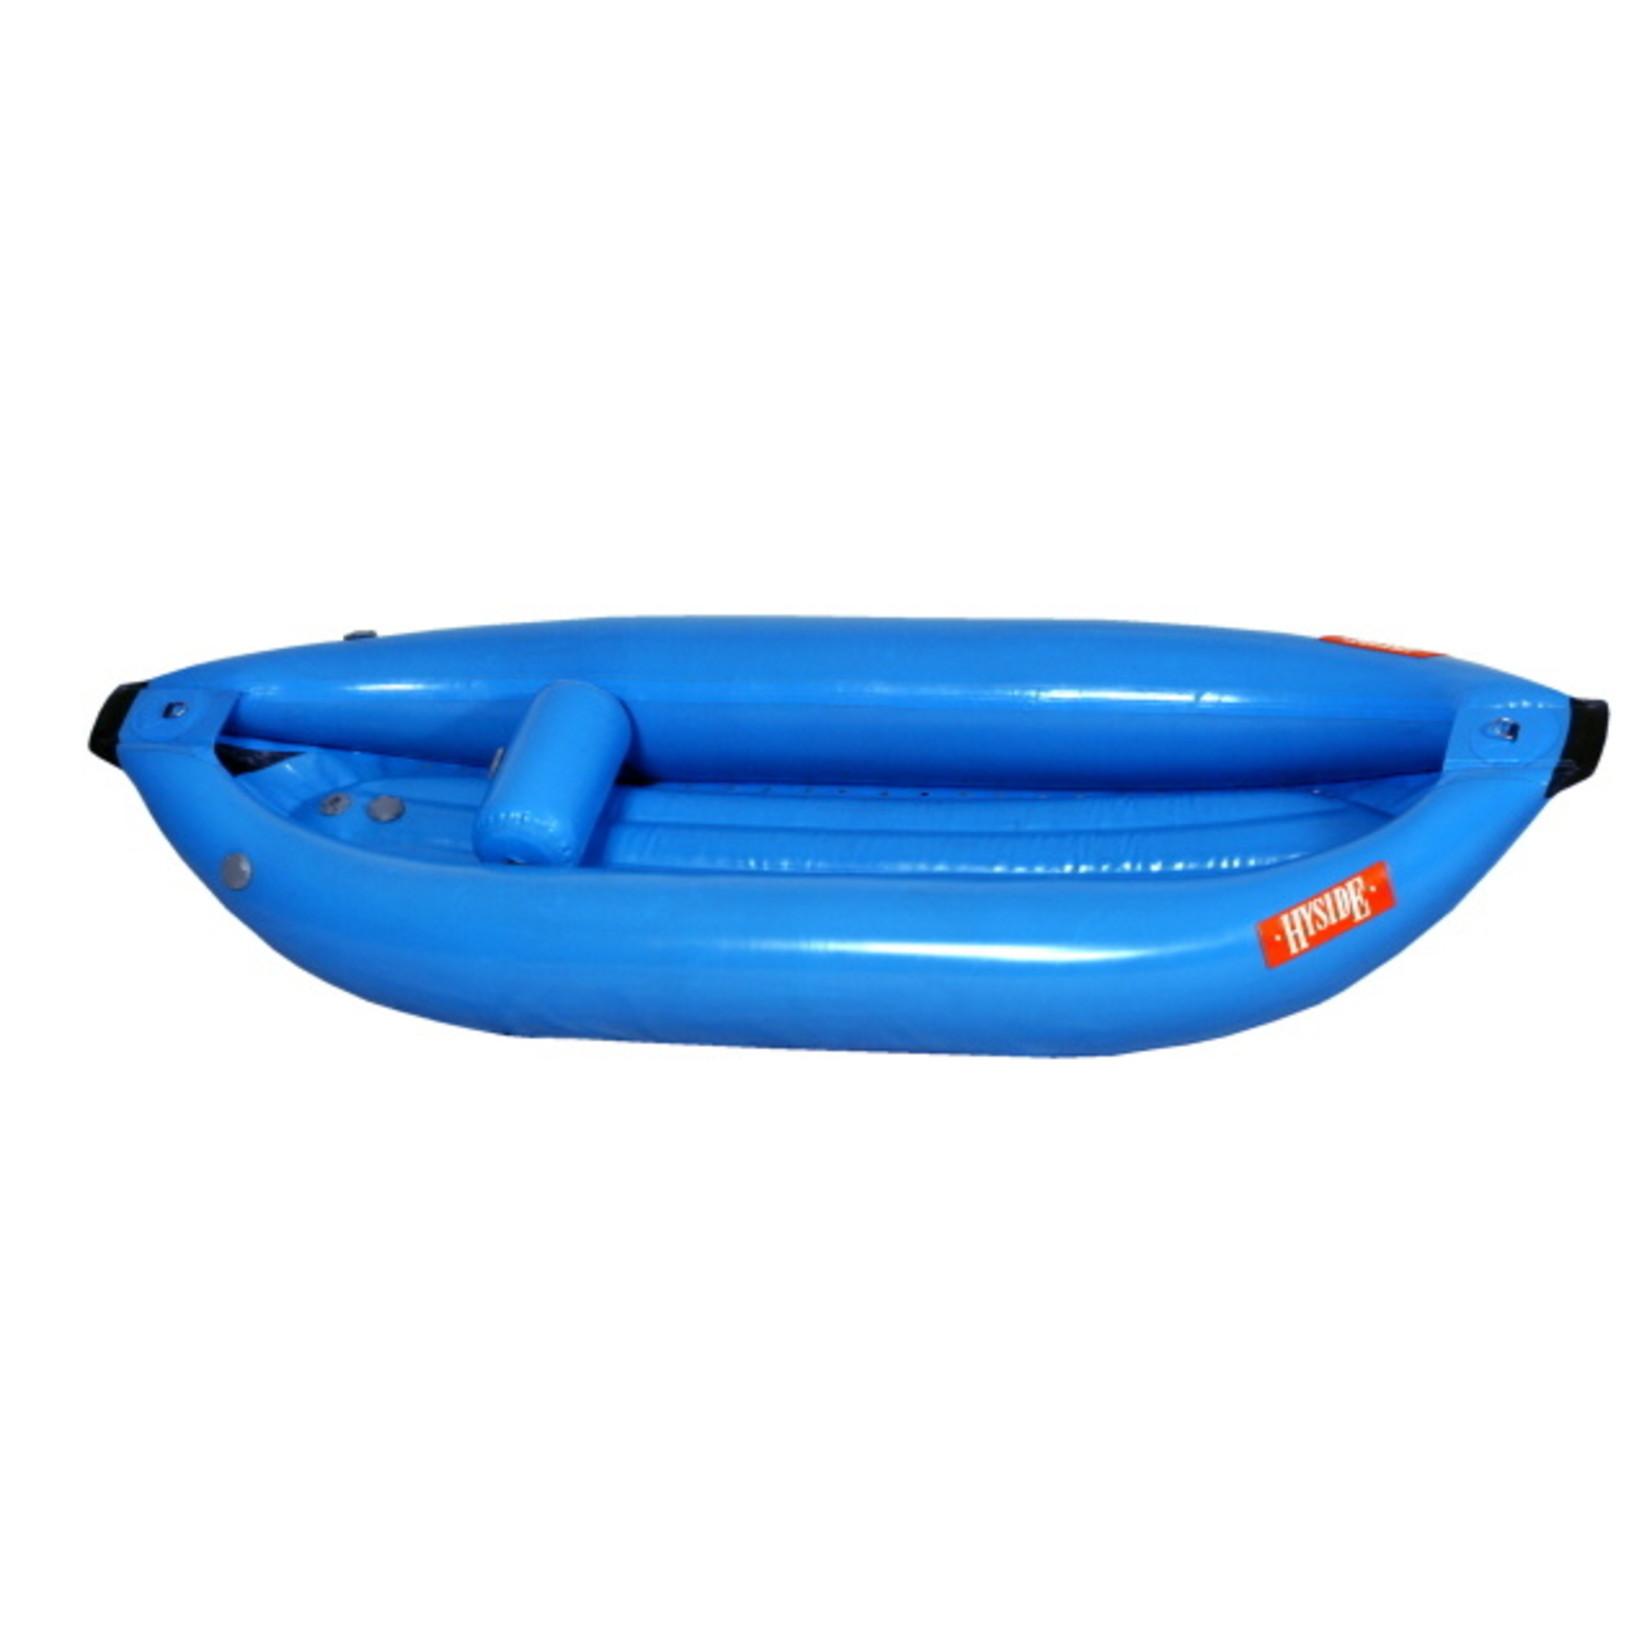 Hyside Inflatables Hyside Padillac I Kayak